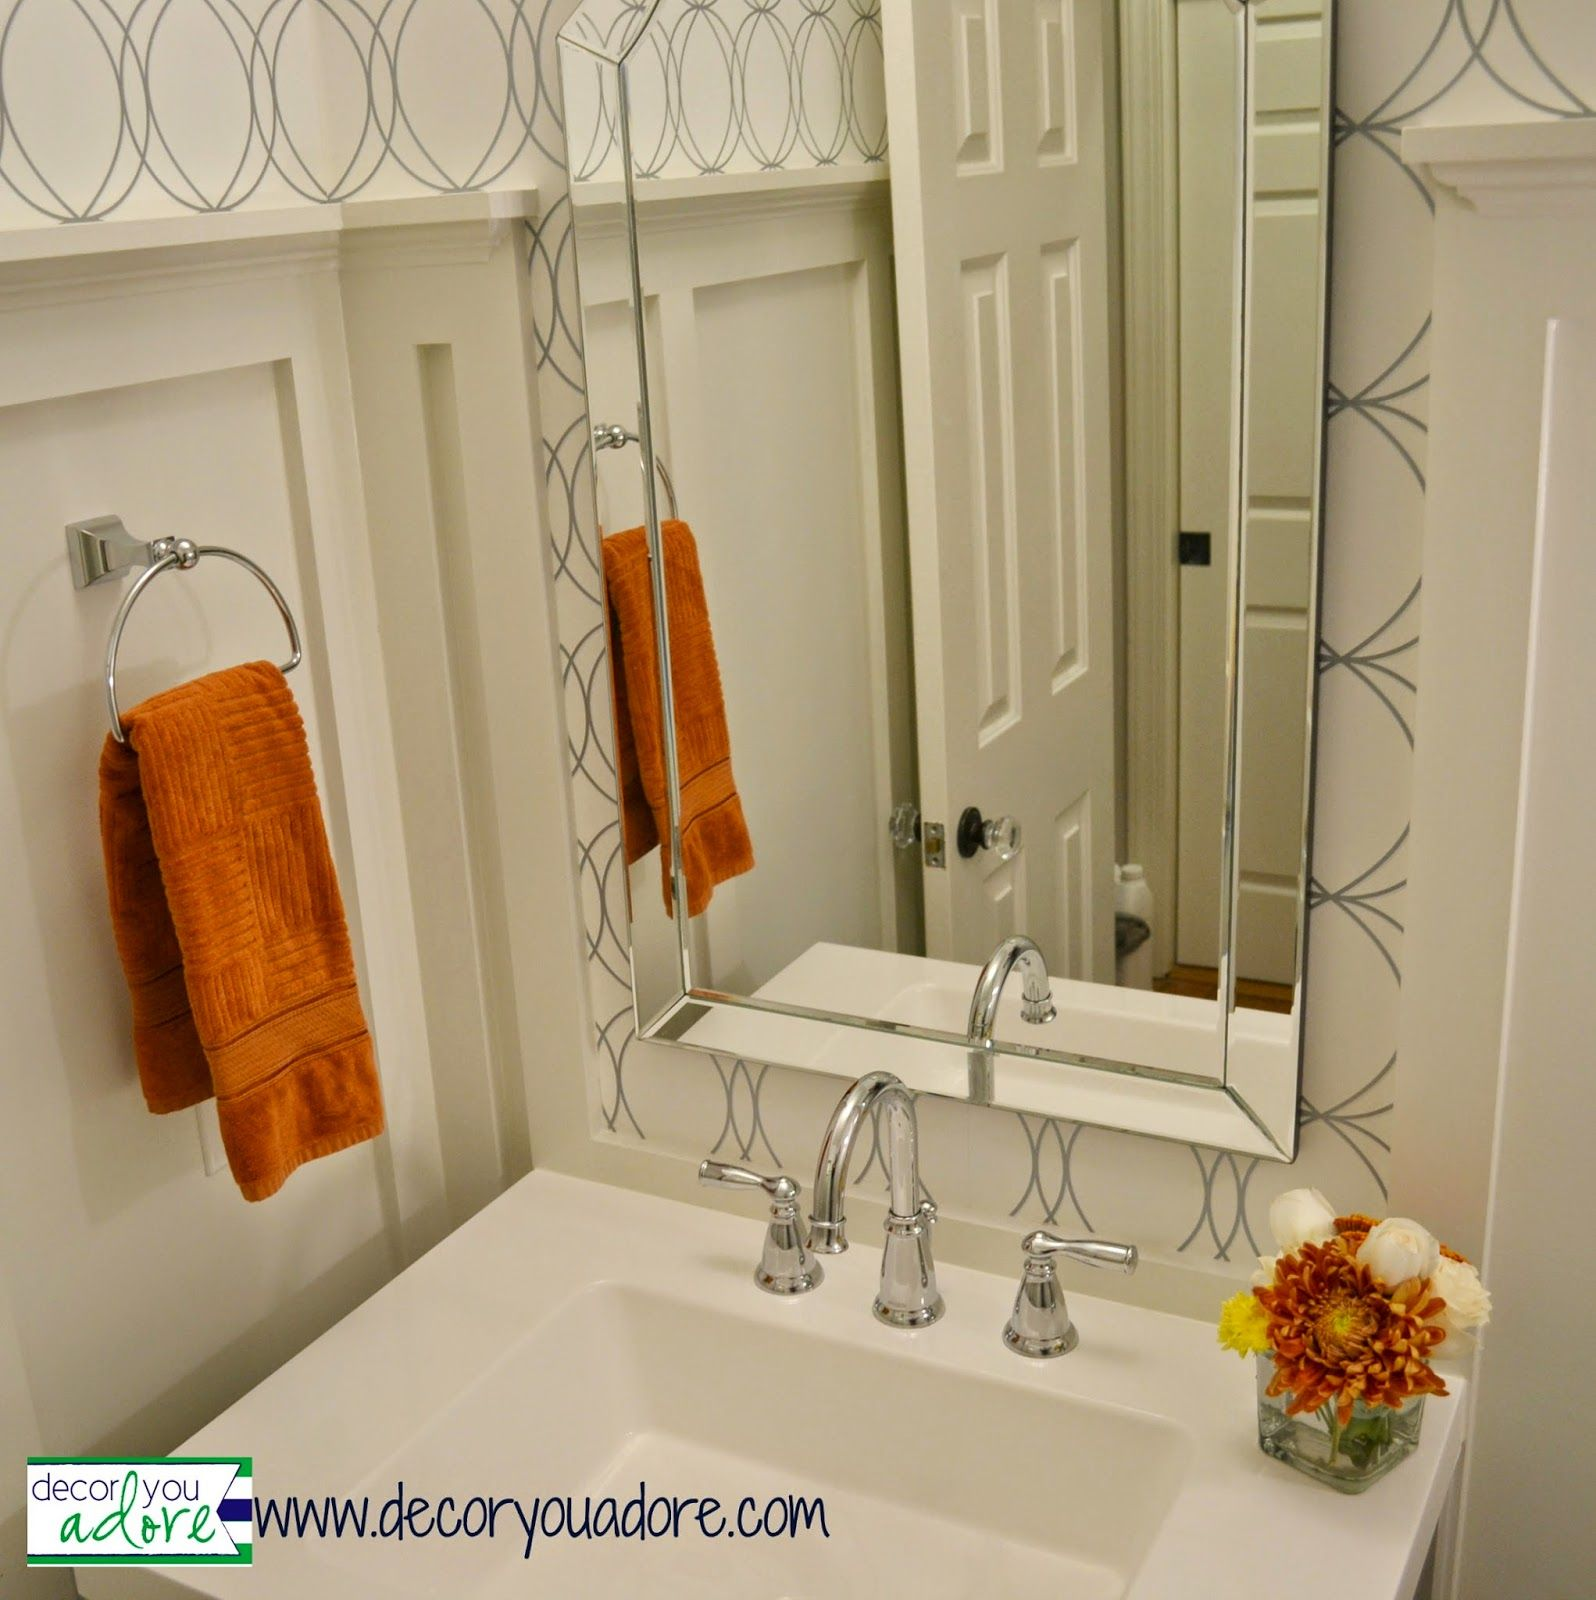 decor you adore dramatic before amp after powder bath